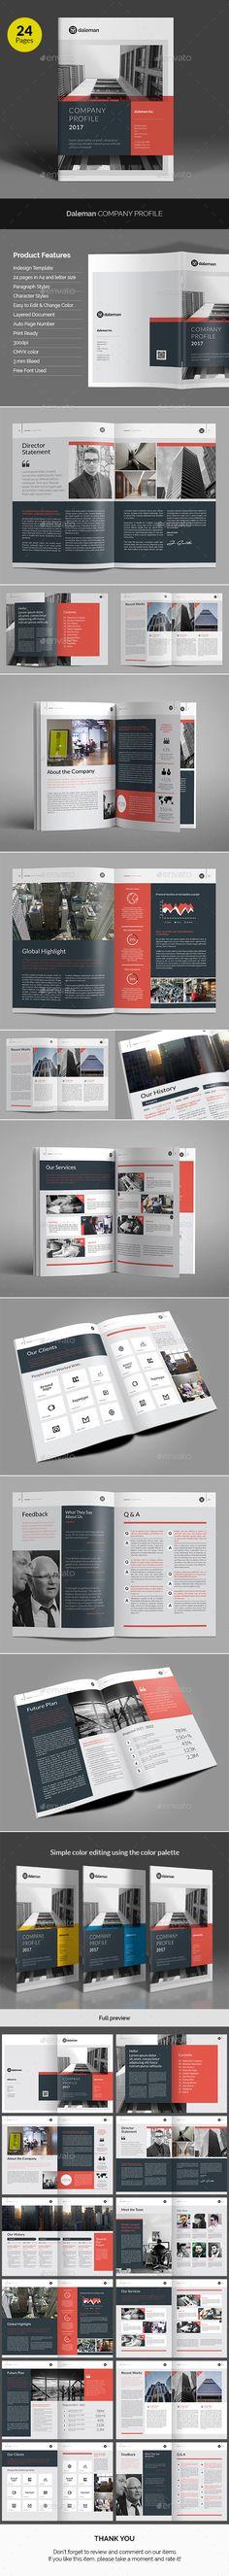 #Daleman #Company #Profile - #Corporate #Brochures Download here: https://graphicriver.net/item/daleman-company-profile/16883962?ref=artgallery8                                                                                                                                                                                 More